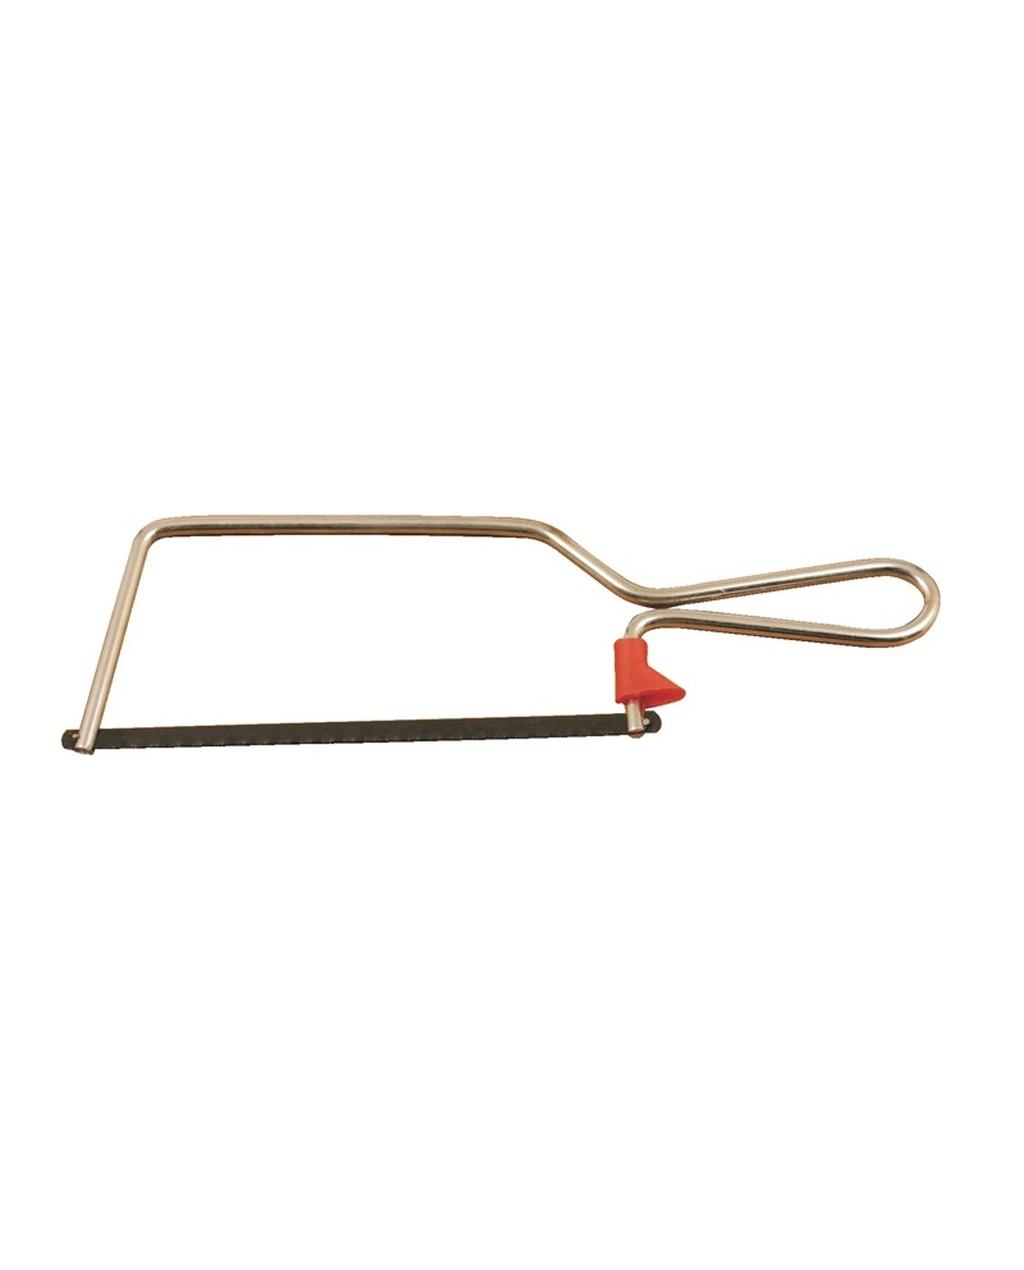 Basic Junior Hacksaw